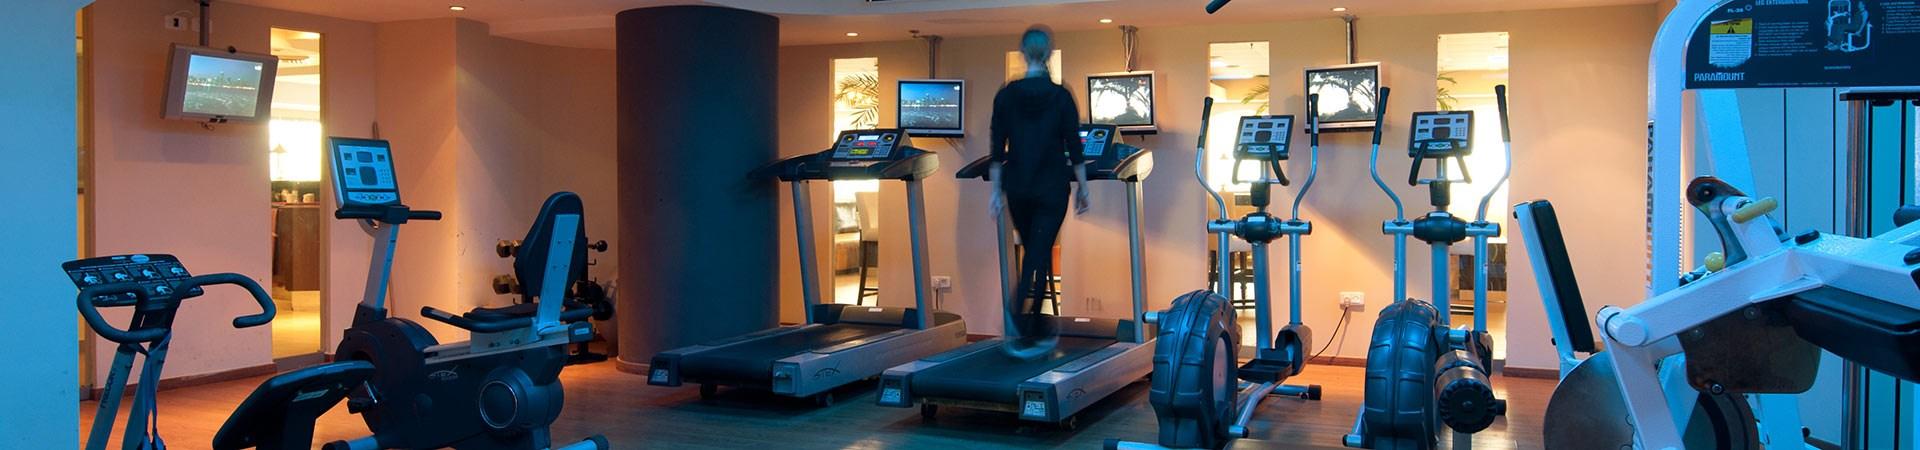 oasis---fitness-center